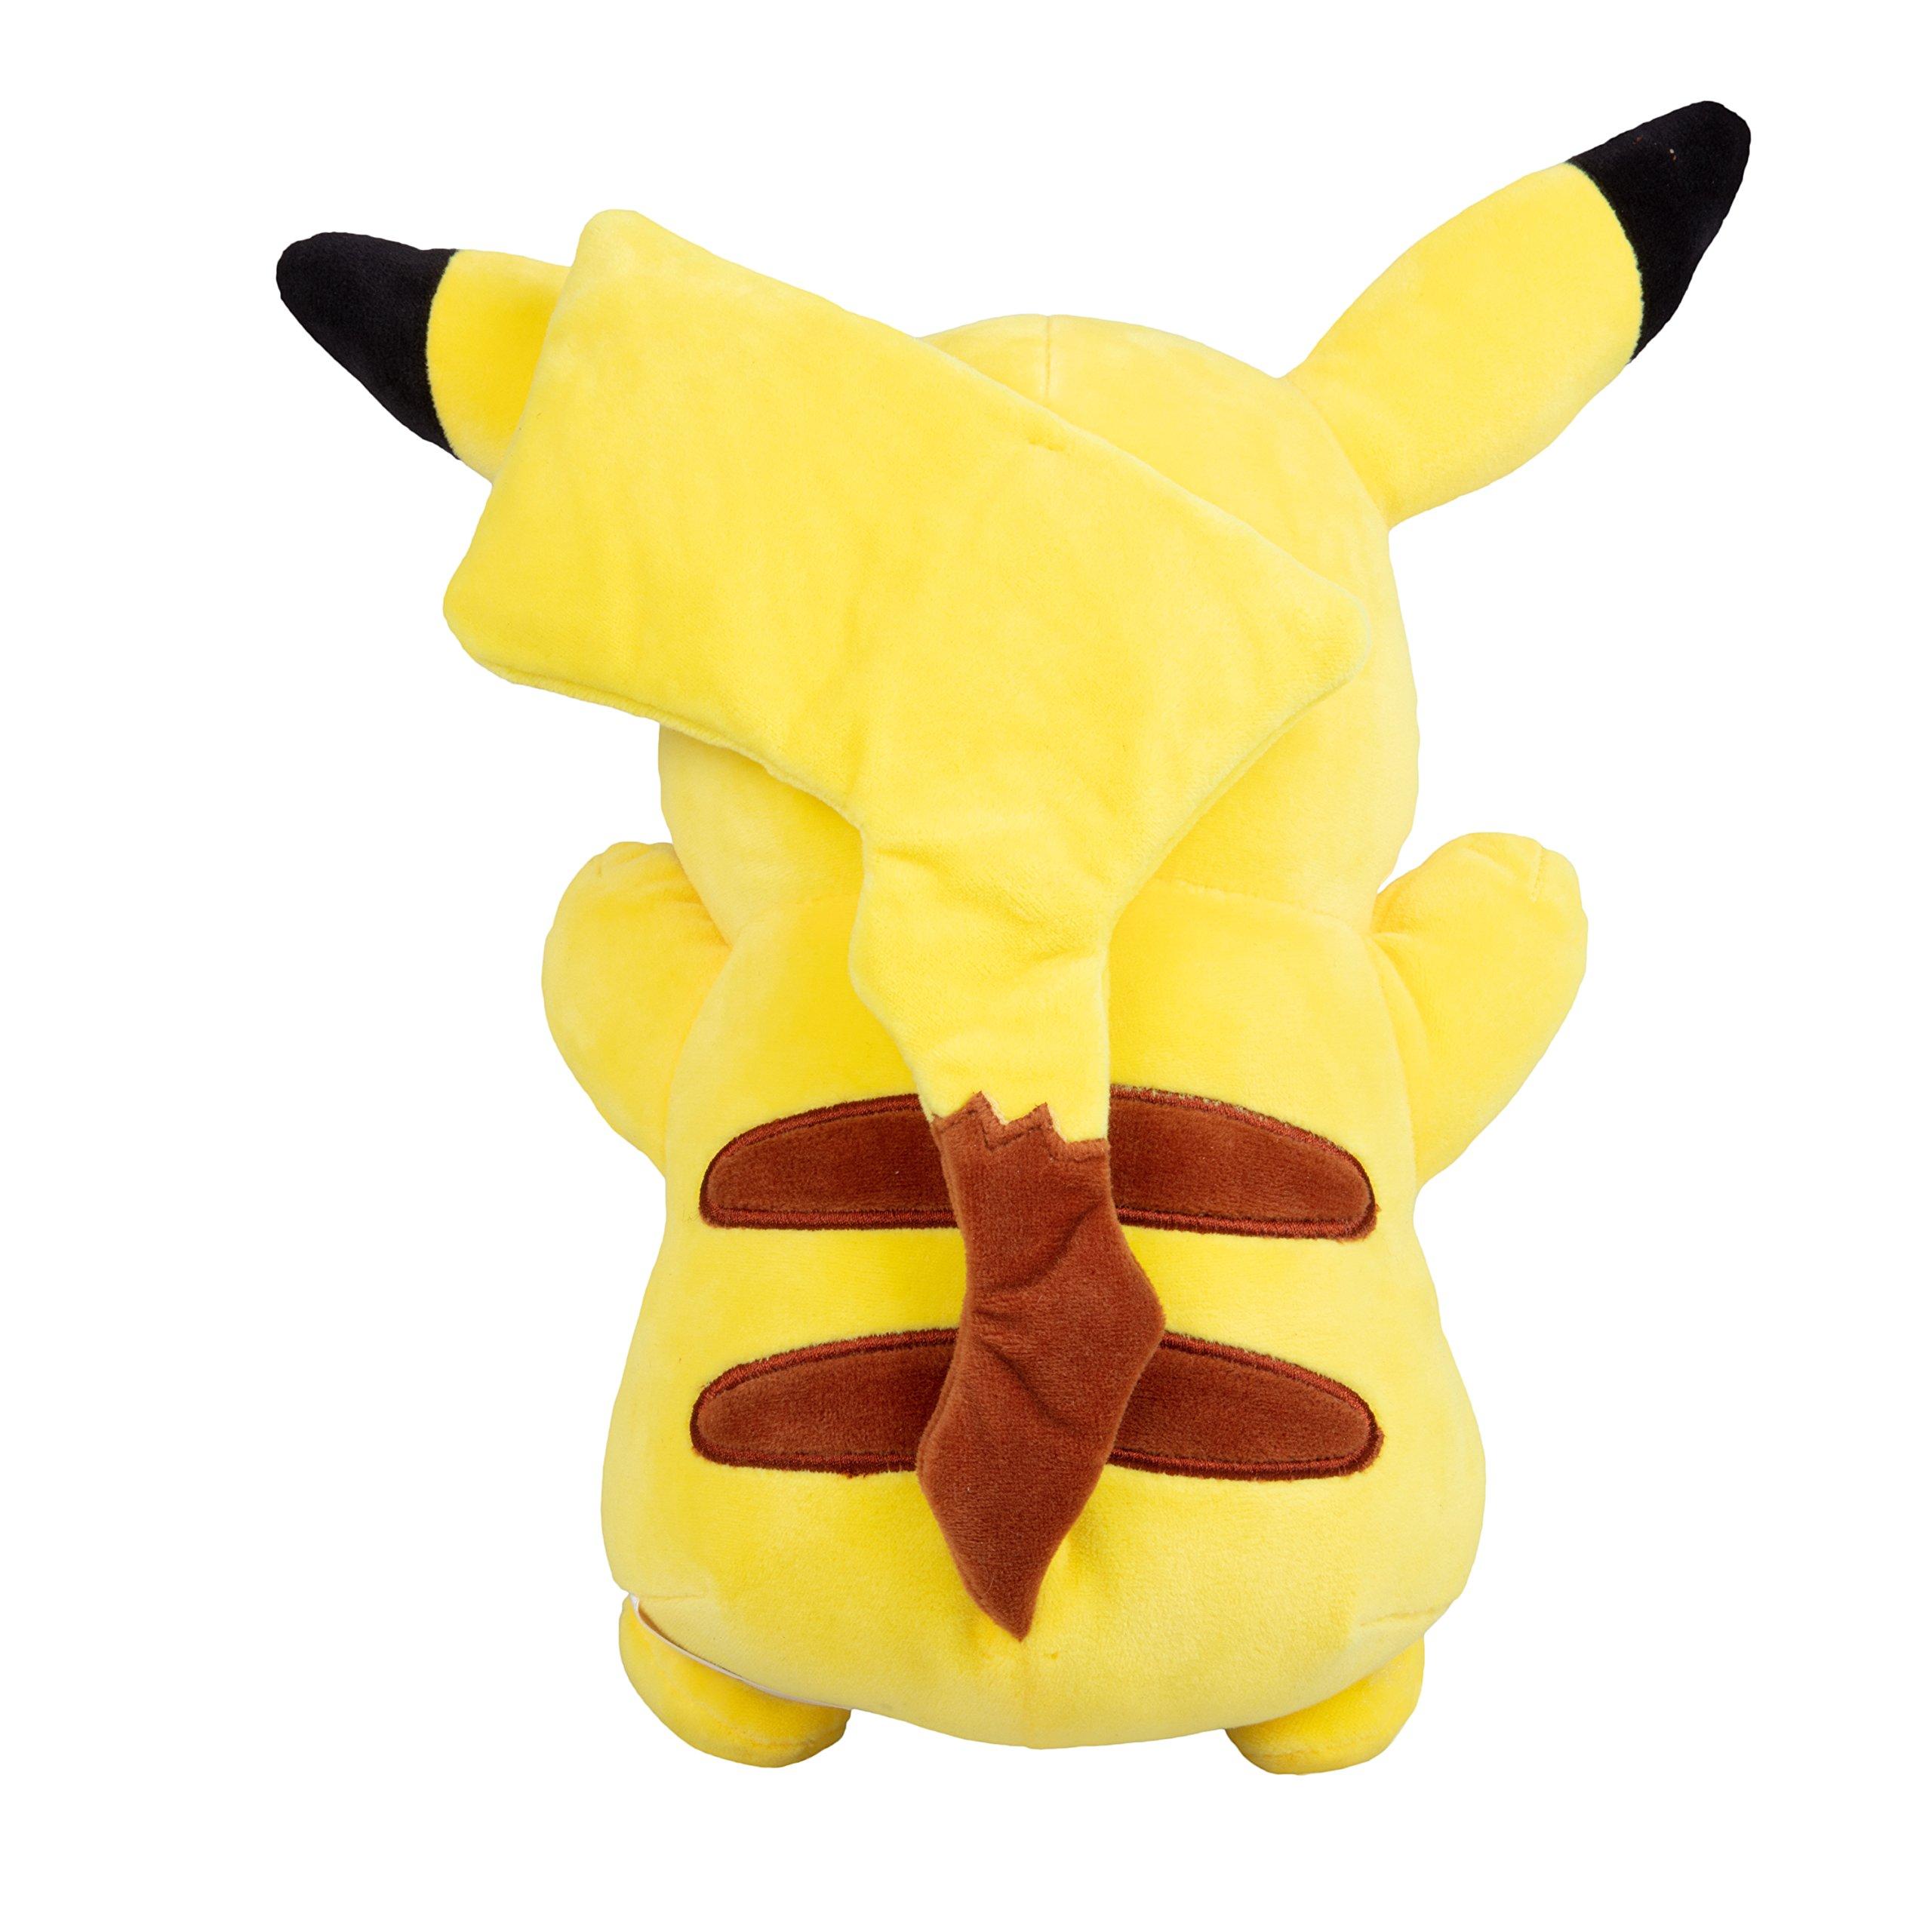 "Pokemon Plush, Large 12"" Inch Plush Pikachu"